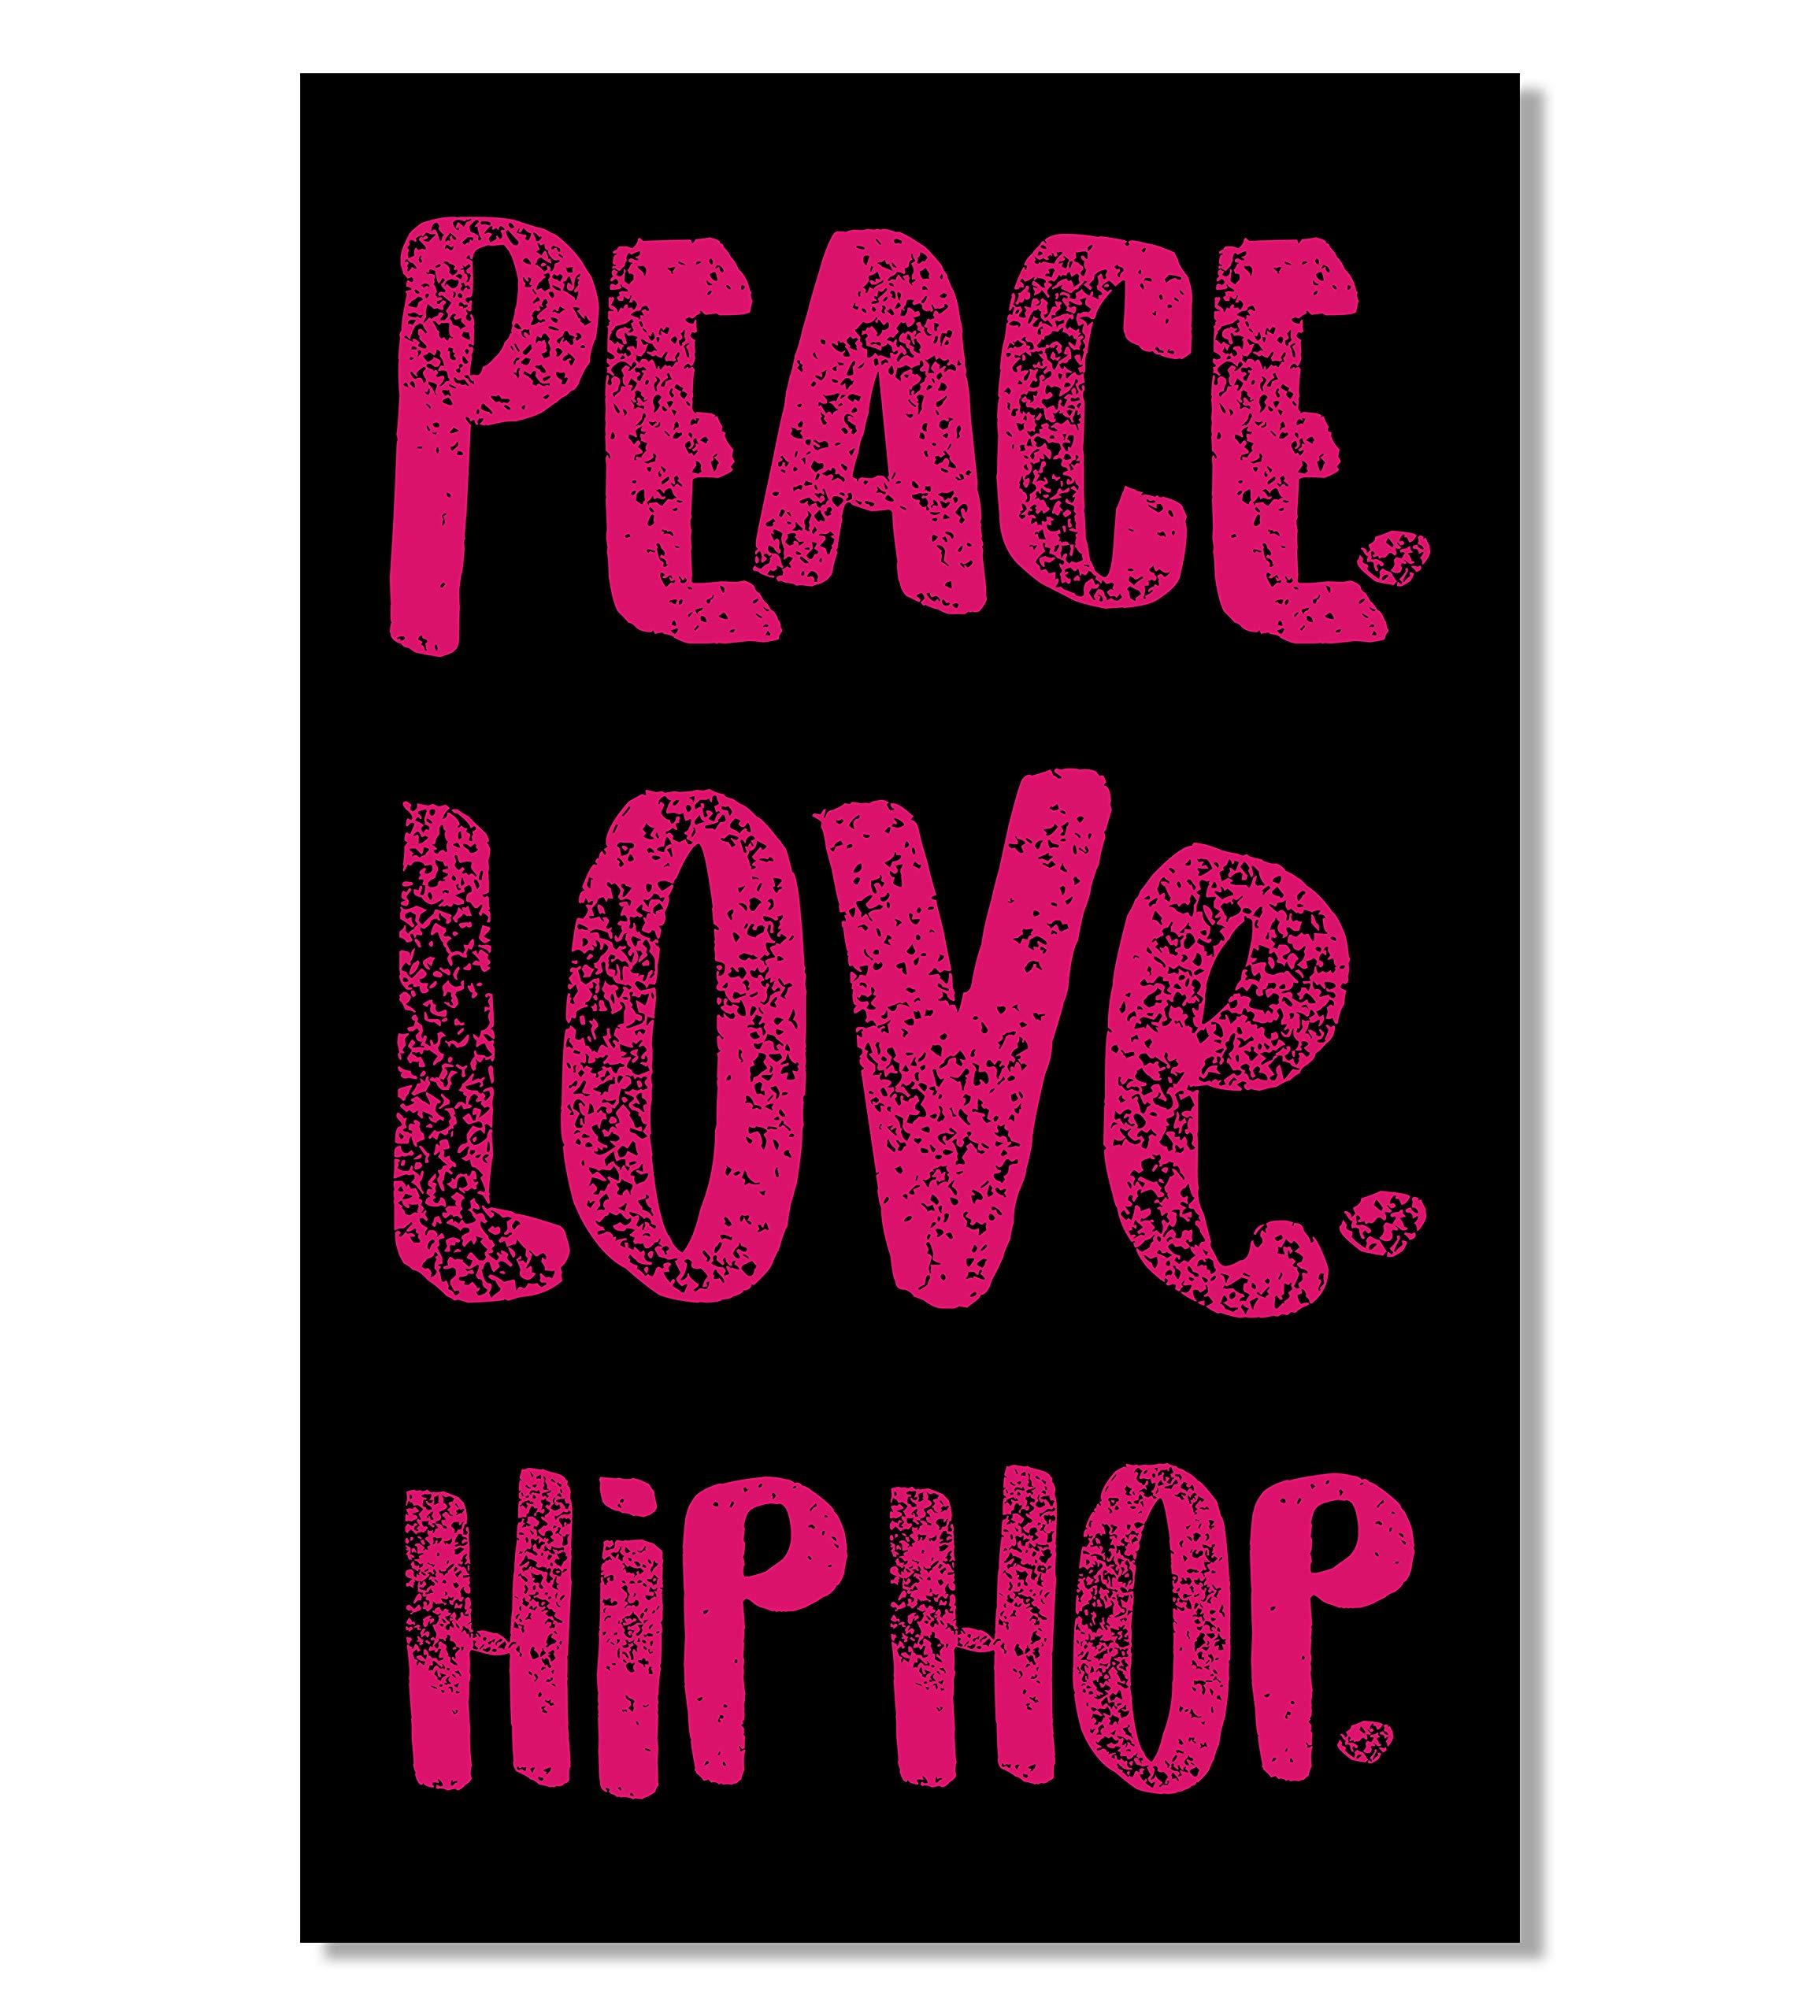 Peace Love Hip Hop Poster, 11x17 Inches, Music Wall Art Print, Artist Decoration College Dorm, Teen Dancer, Rap